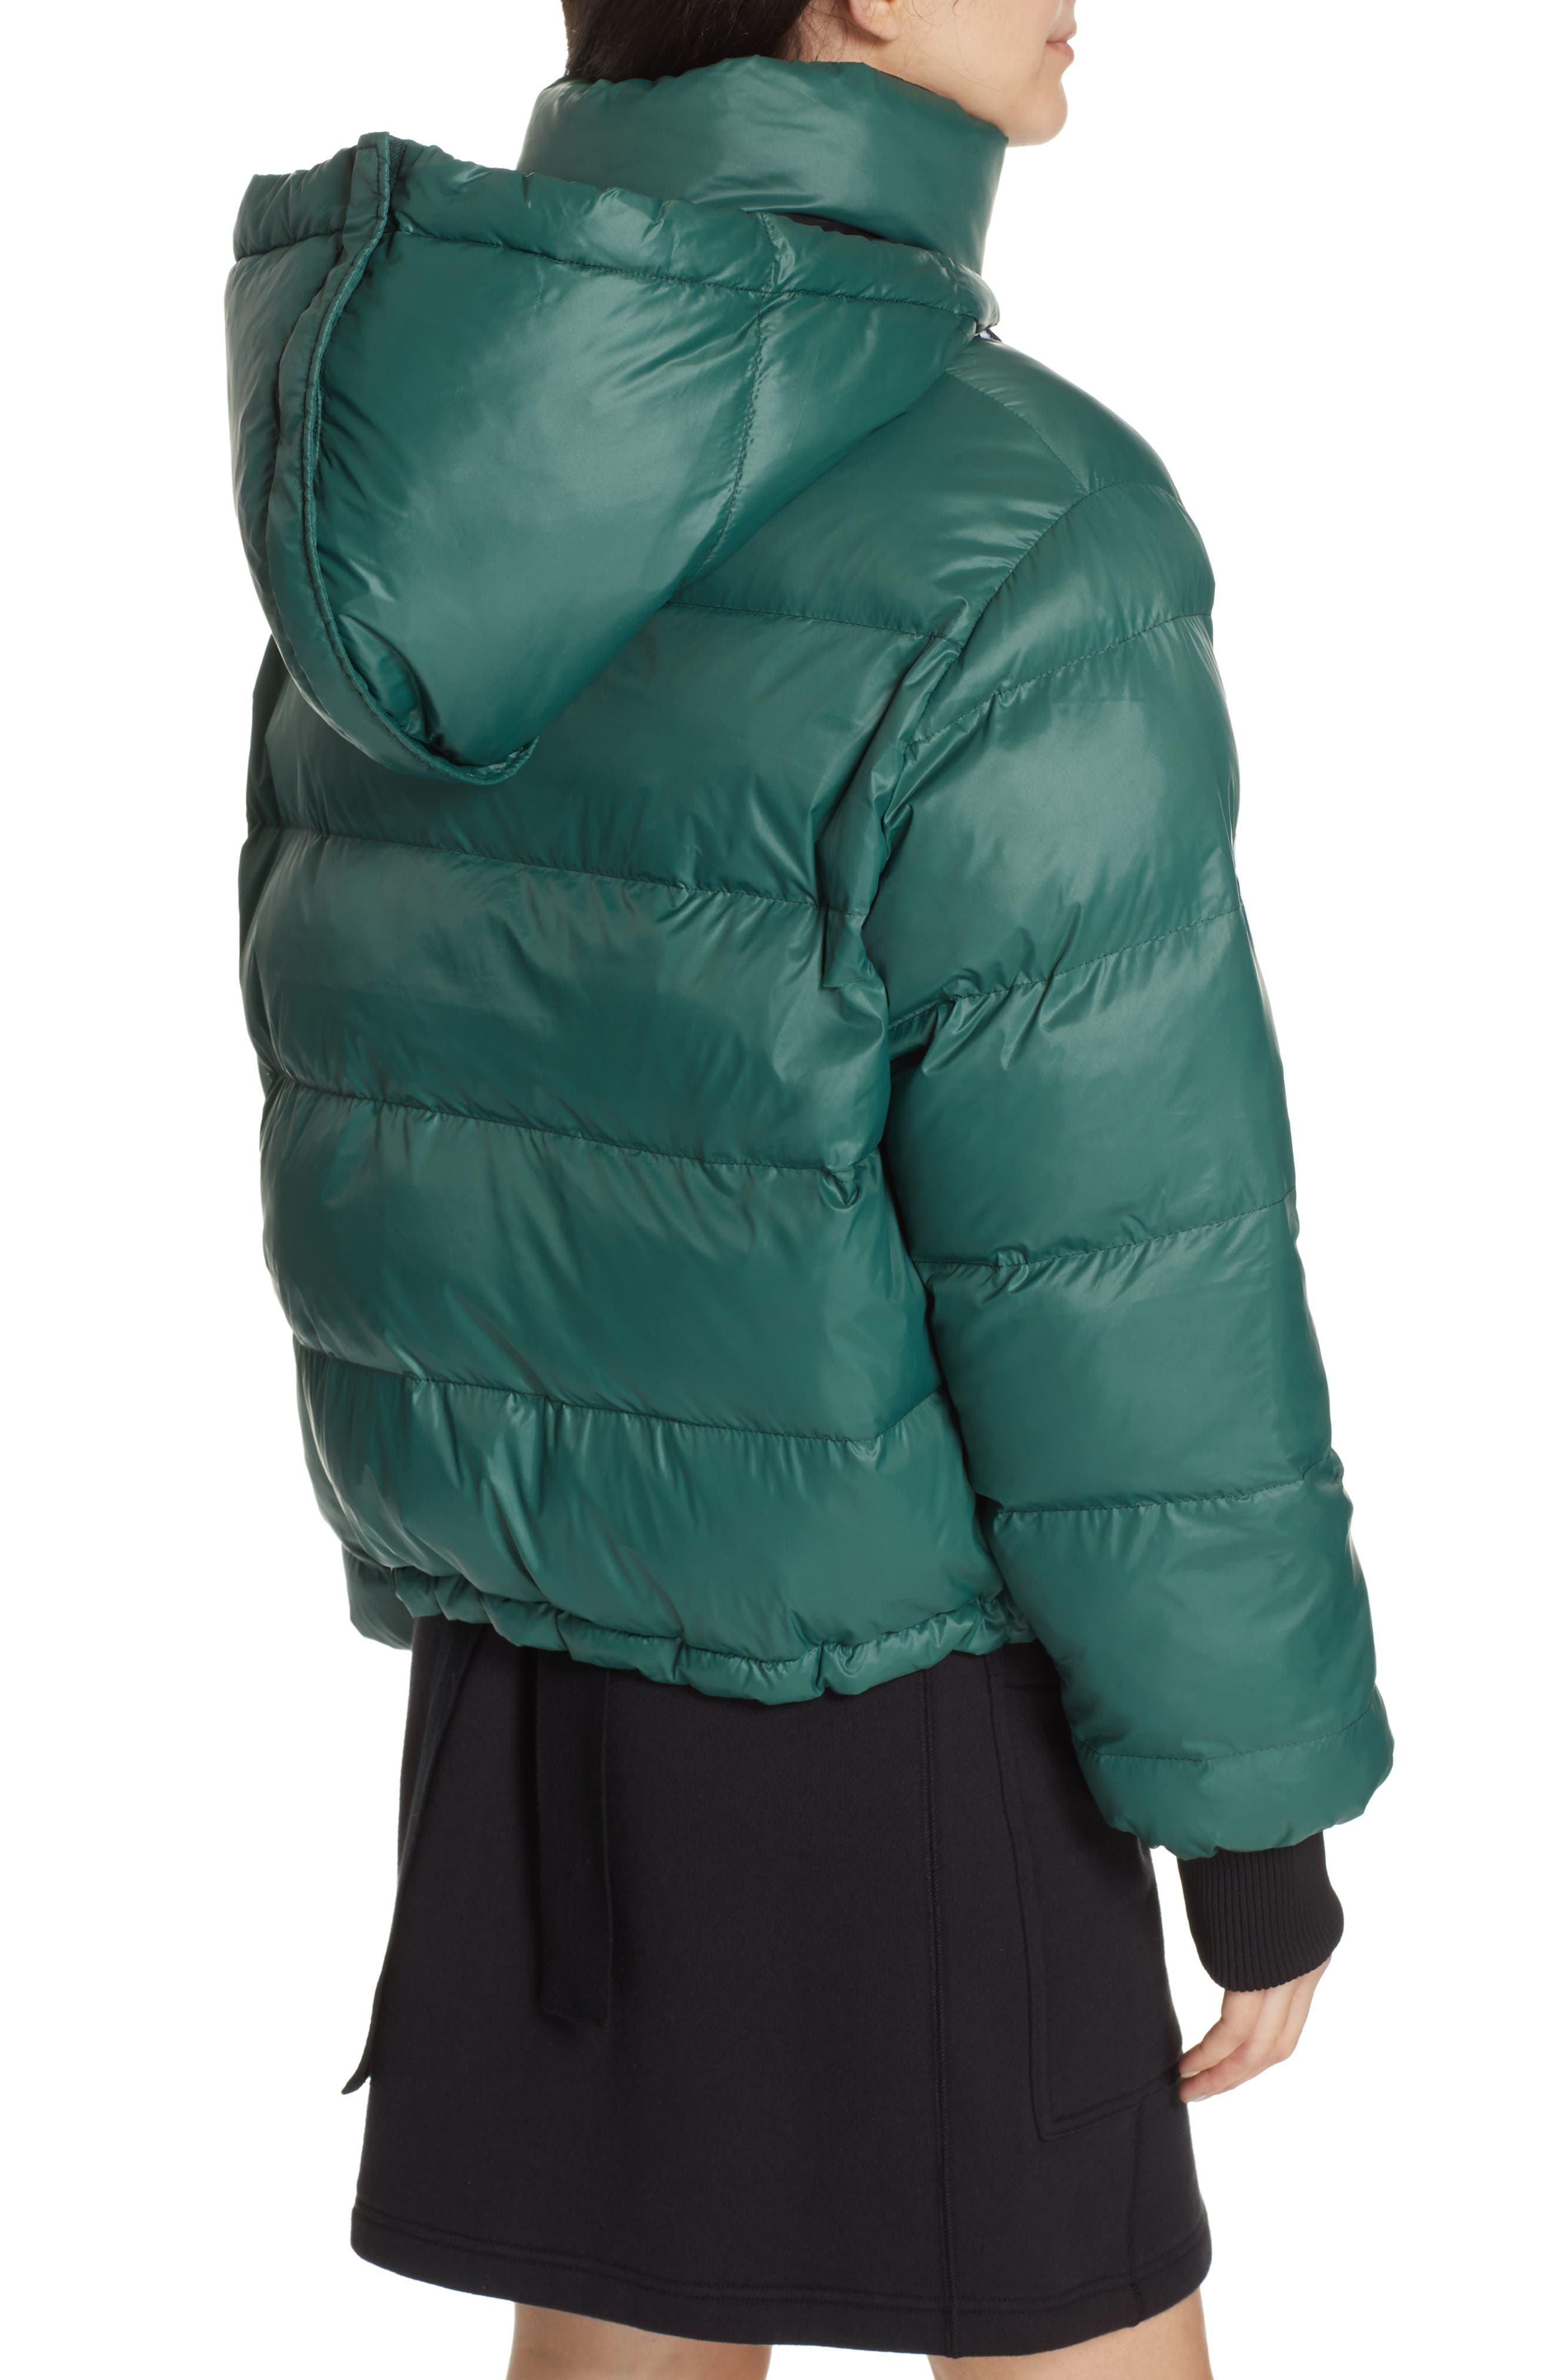 PROENZA SCHOULER, PSWL Reversible Puffer Coat, Alternate thumbnail 4, color, GREEN/ BLACK